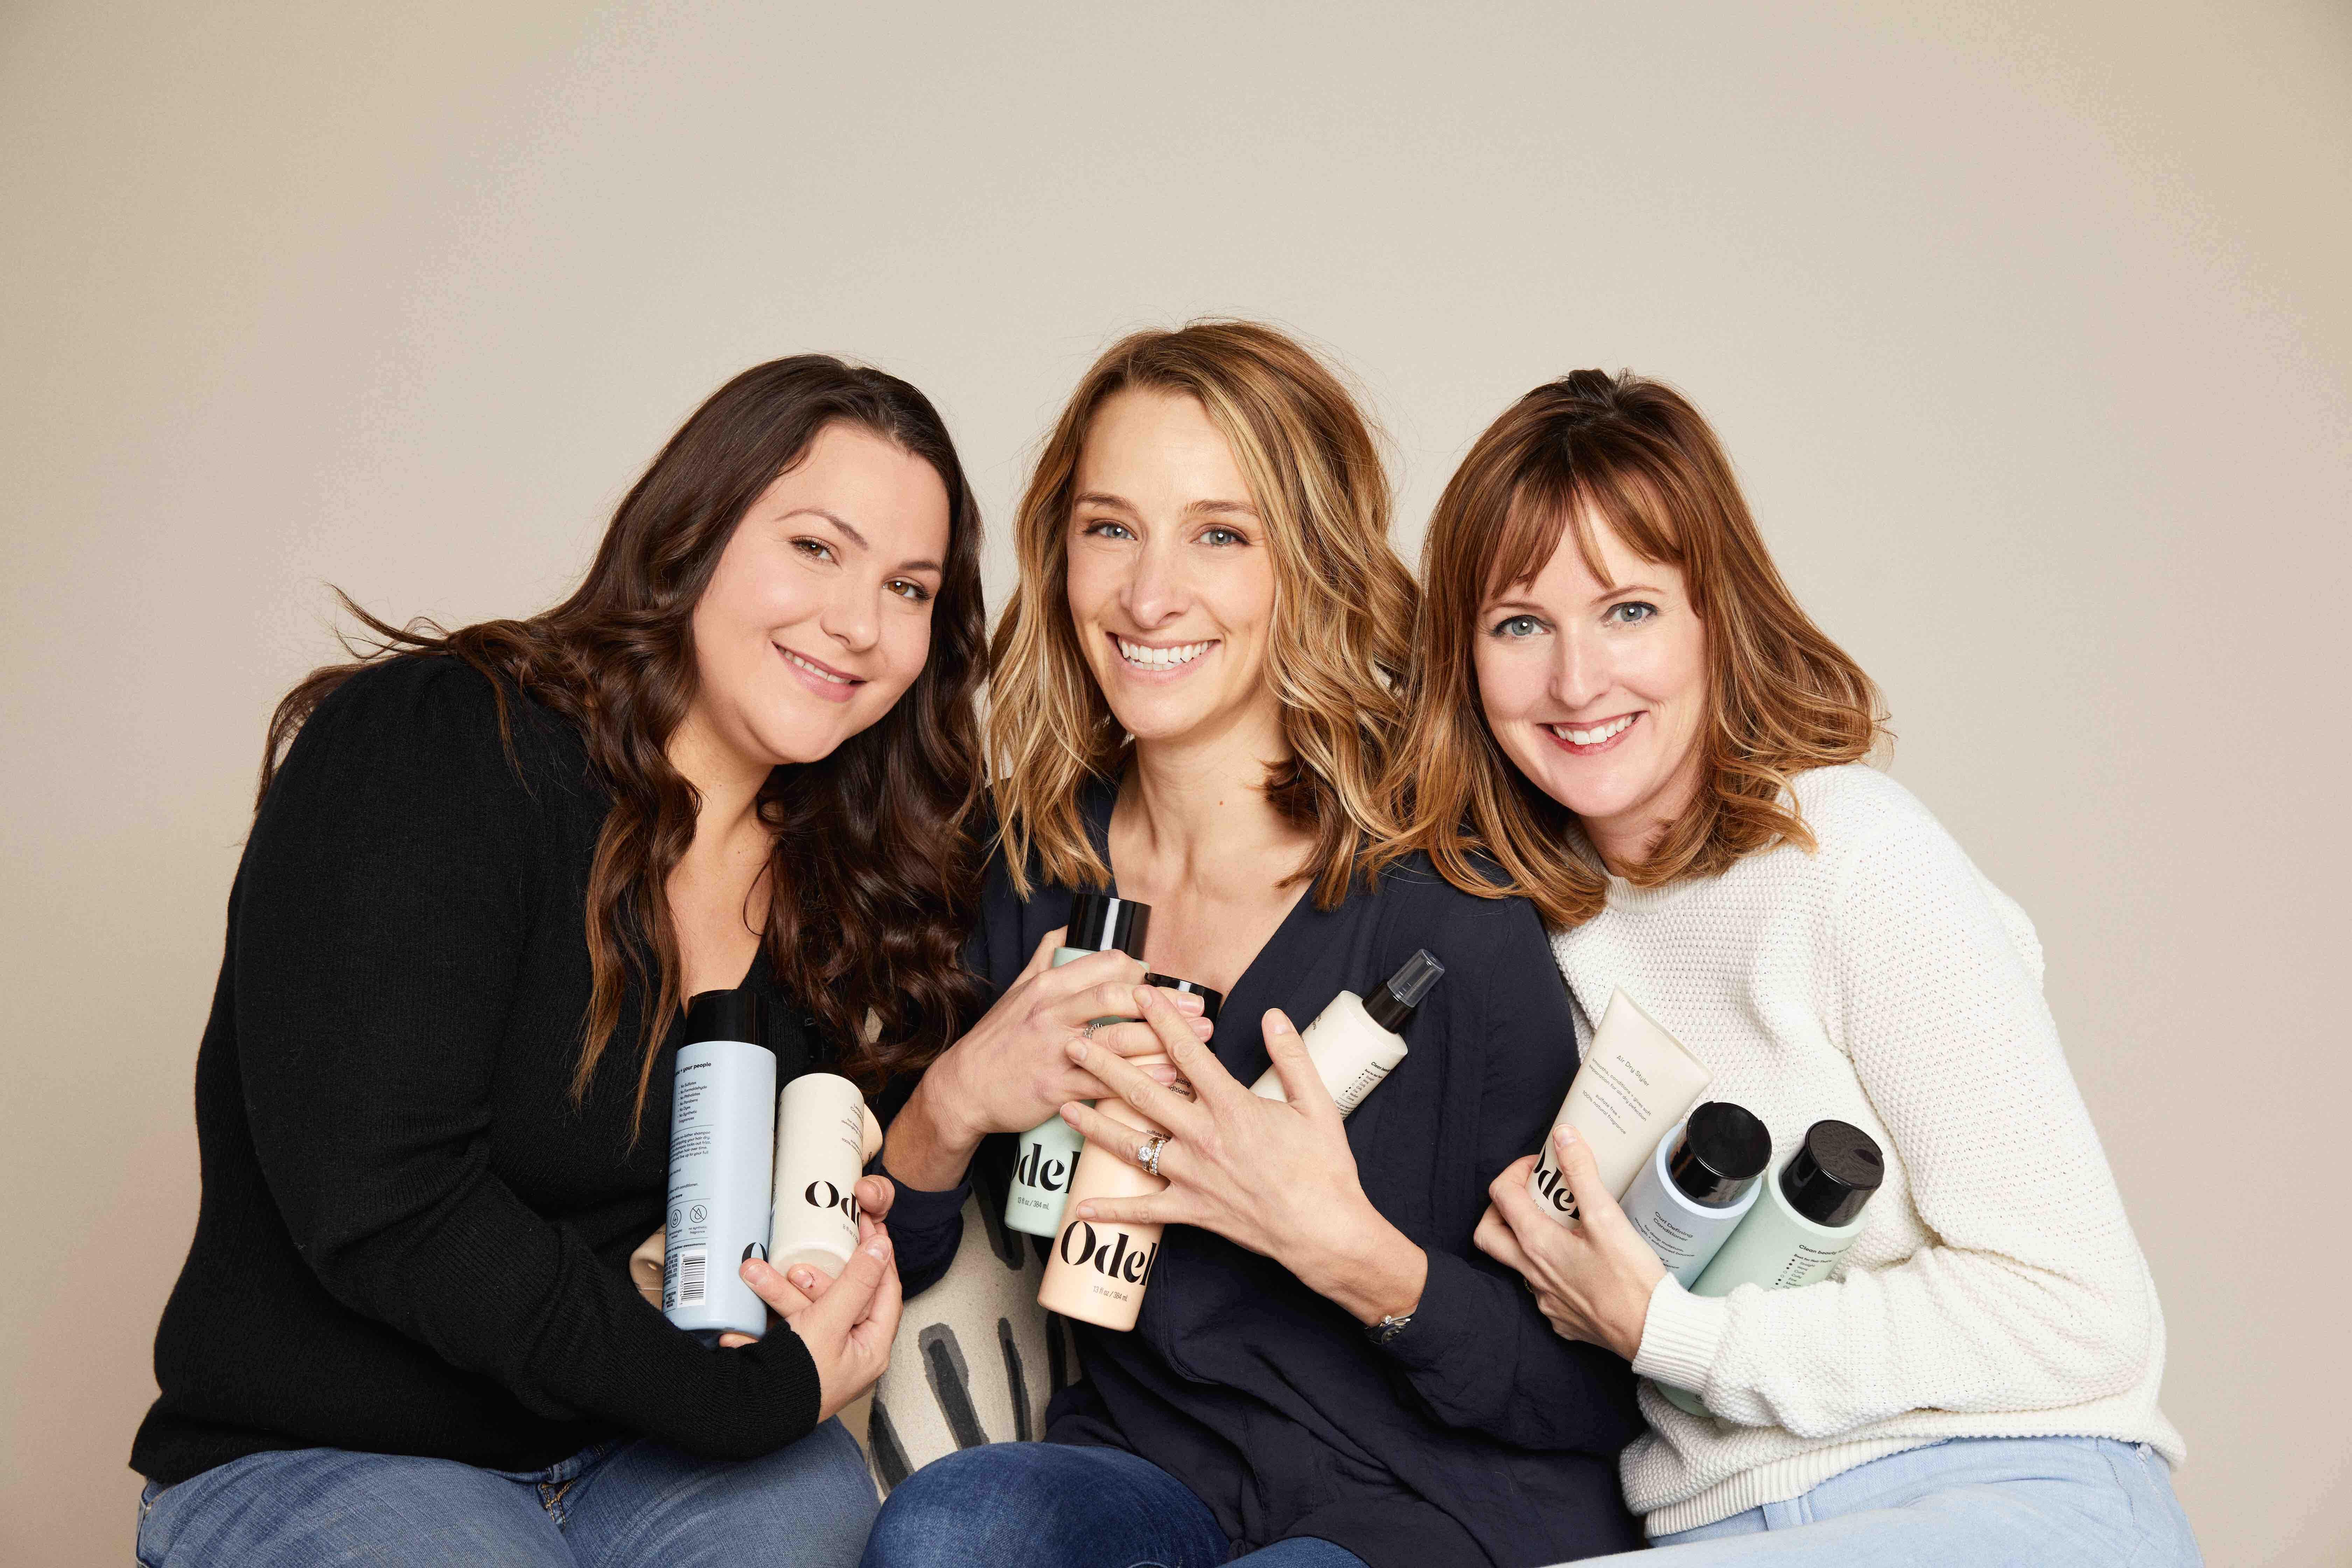 Odele co-founders Shannon Kearney, Lindsay Holden and Britta Chatterjee